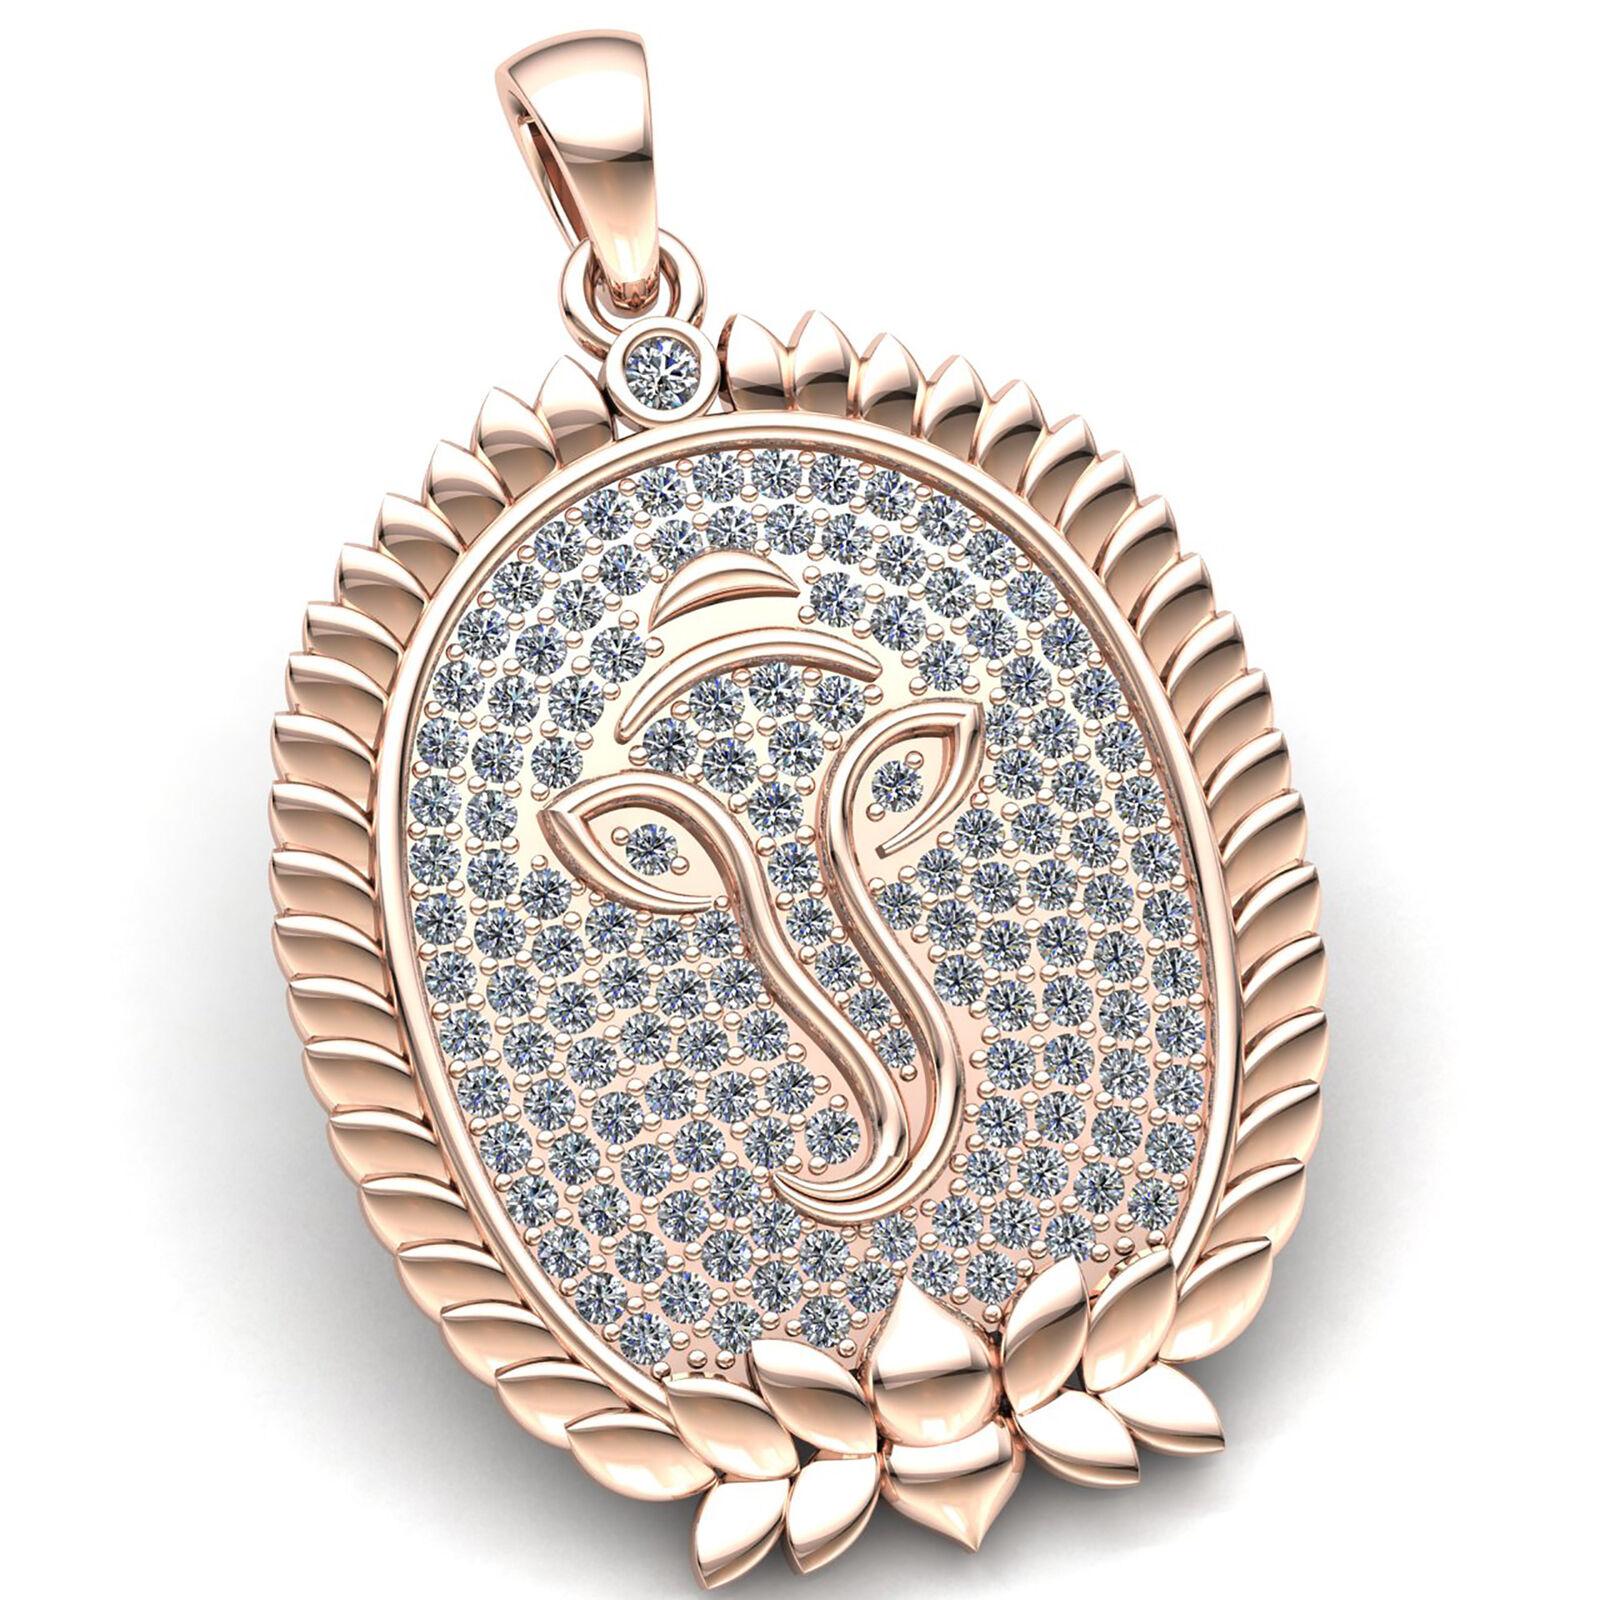 Genuine 5ct Round Cut Diamond Ladies Fancy Ganesh Religious Pendant 18K gold